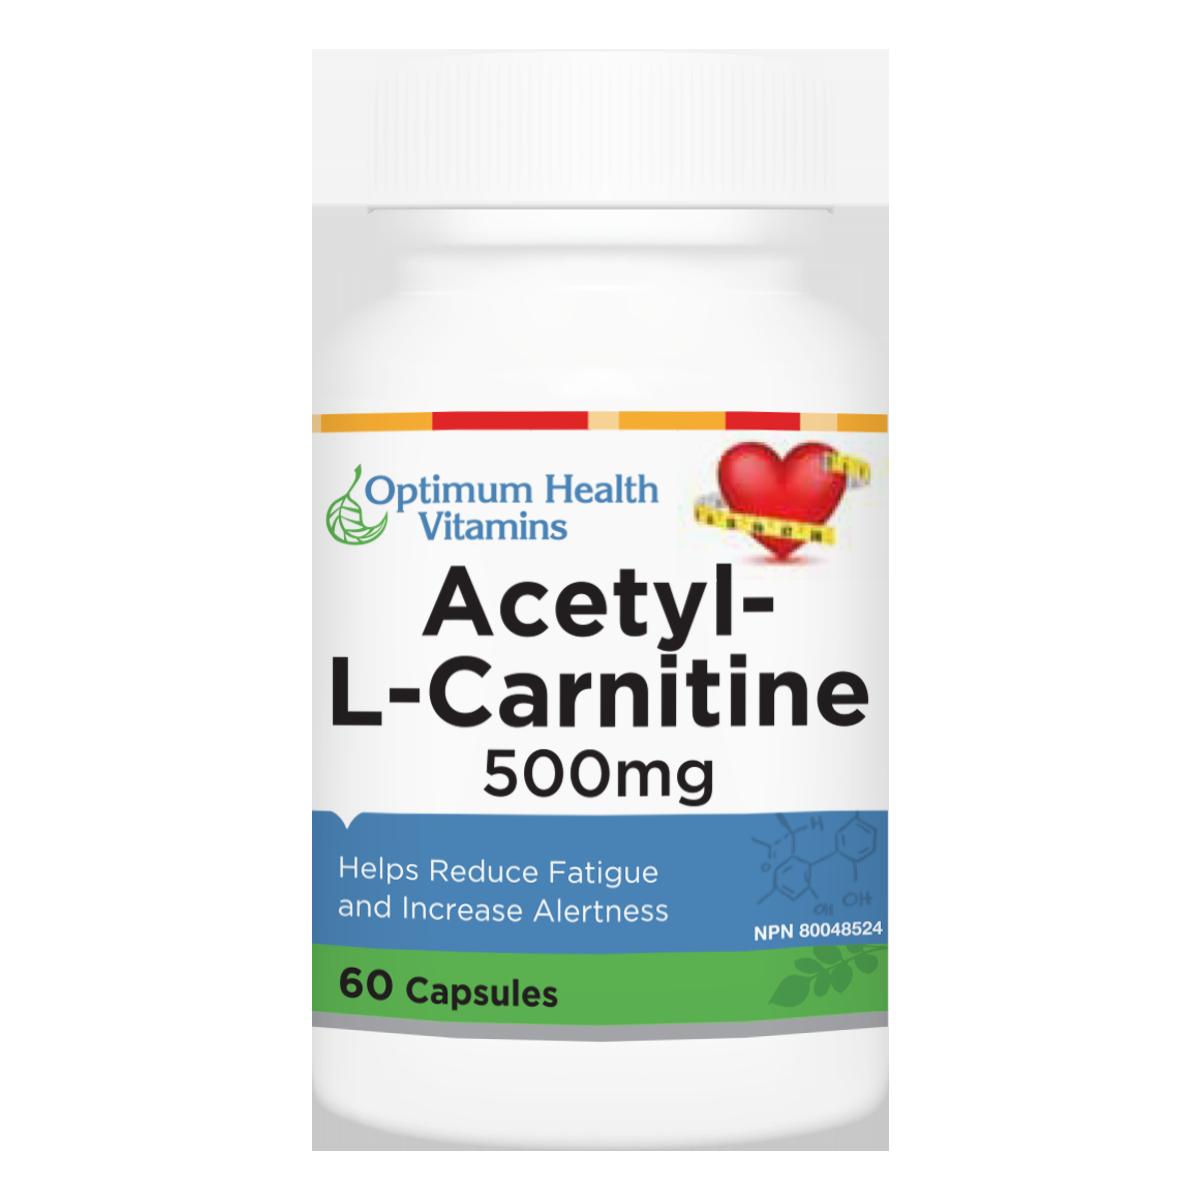 Optimum health Vitains Acetyl L Carnitine